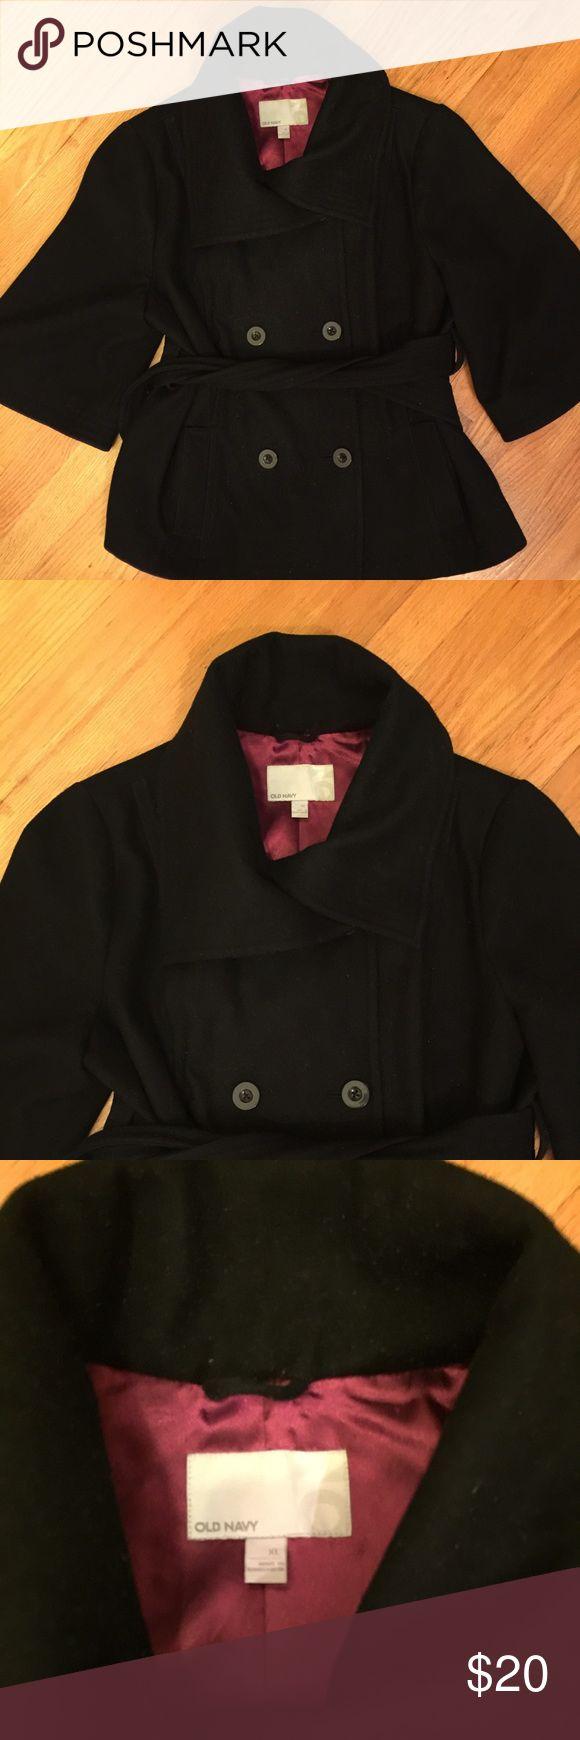 Women's Old Navy 3/4 Sleeve Pea Coat Soze XL Women's Old Navy 3/4 Sleeve Pea Coat Soze X-Large. Black Pea Coat. Old Navy Jackets & Coats Pea Coats